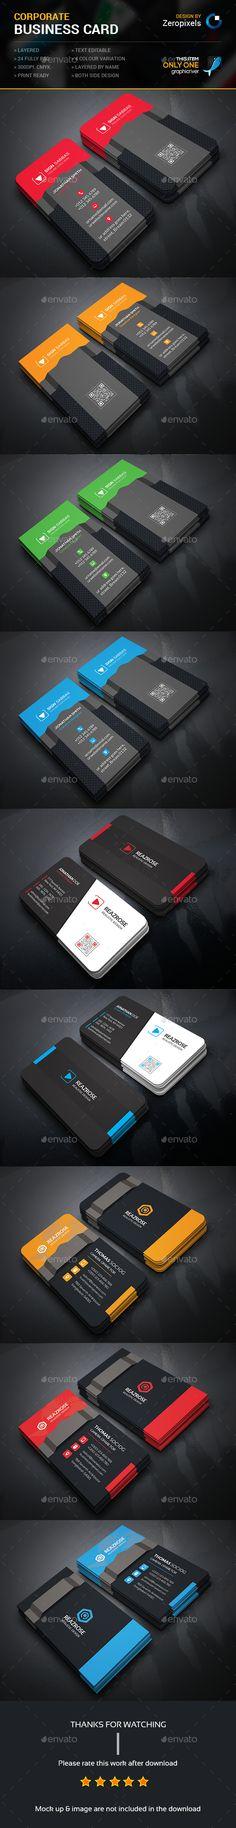 Business Card Bundle Templates PSD. Download here: http://graphicriver.net/item/business-card-bundle/16214186?ref=ksioks